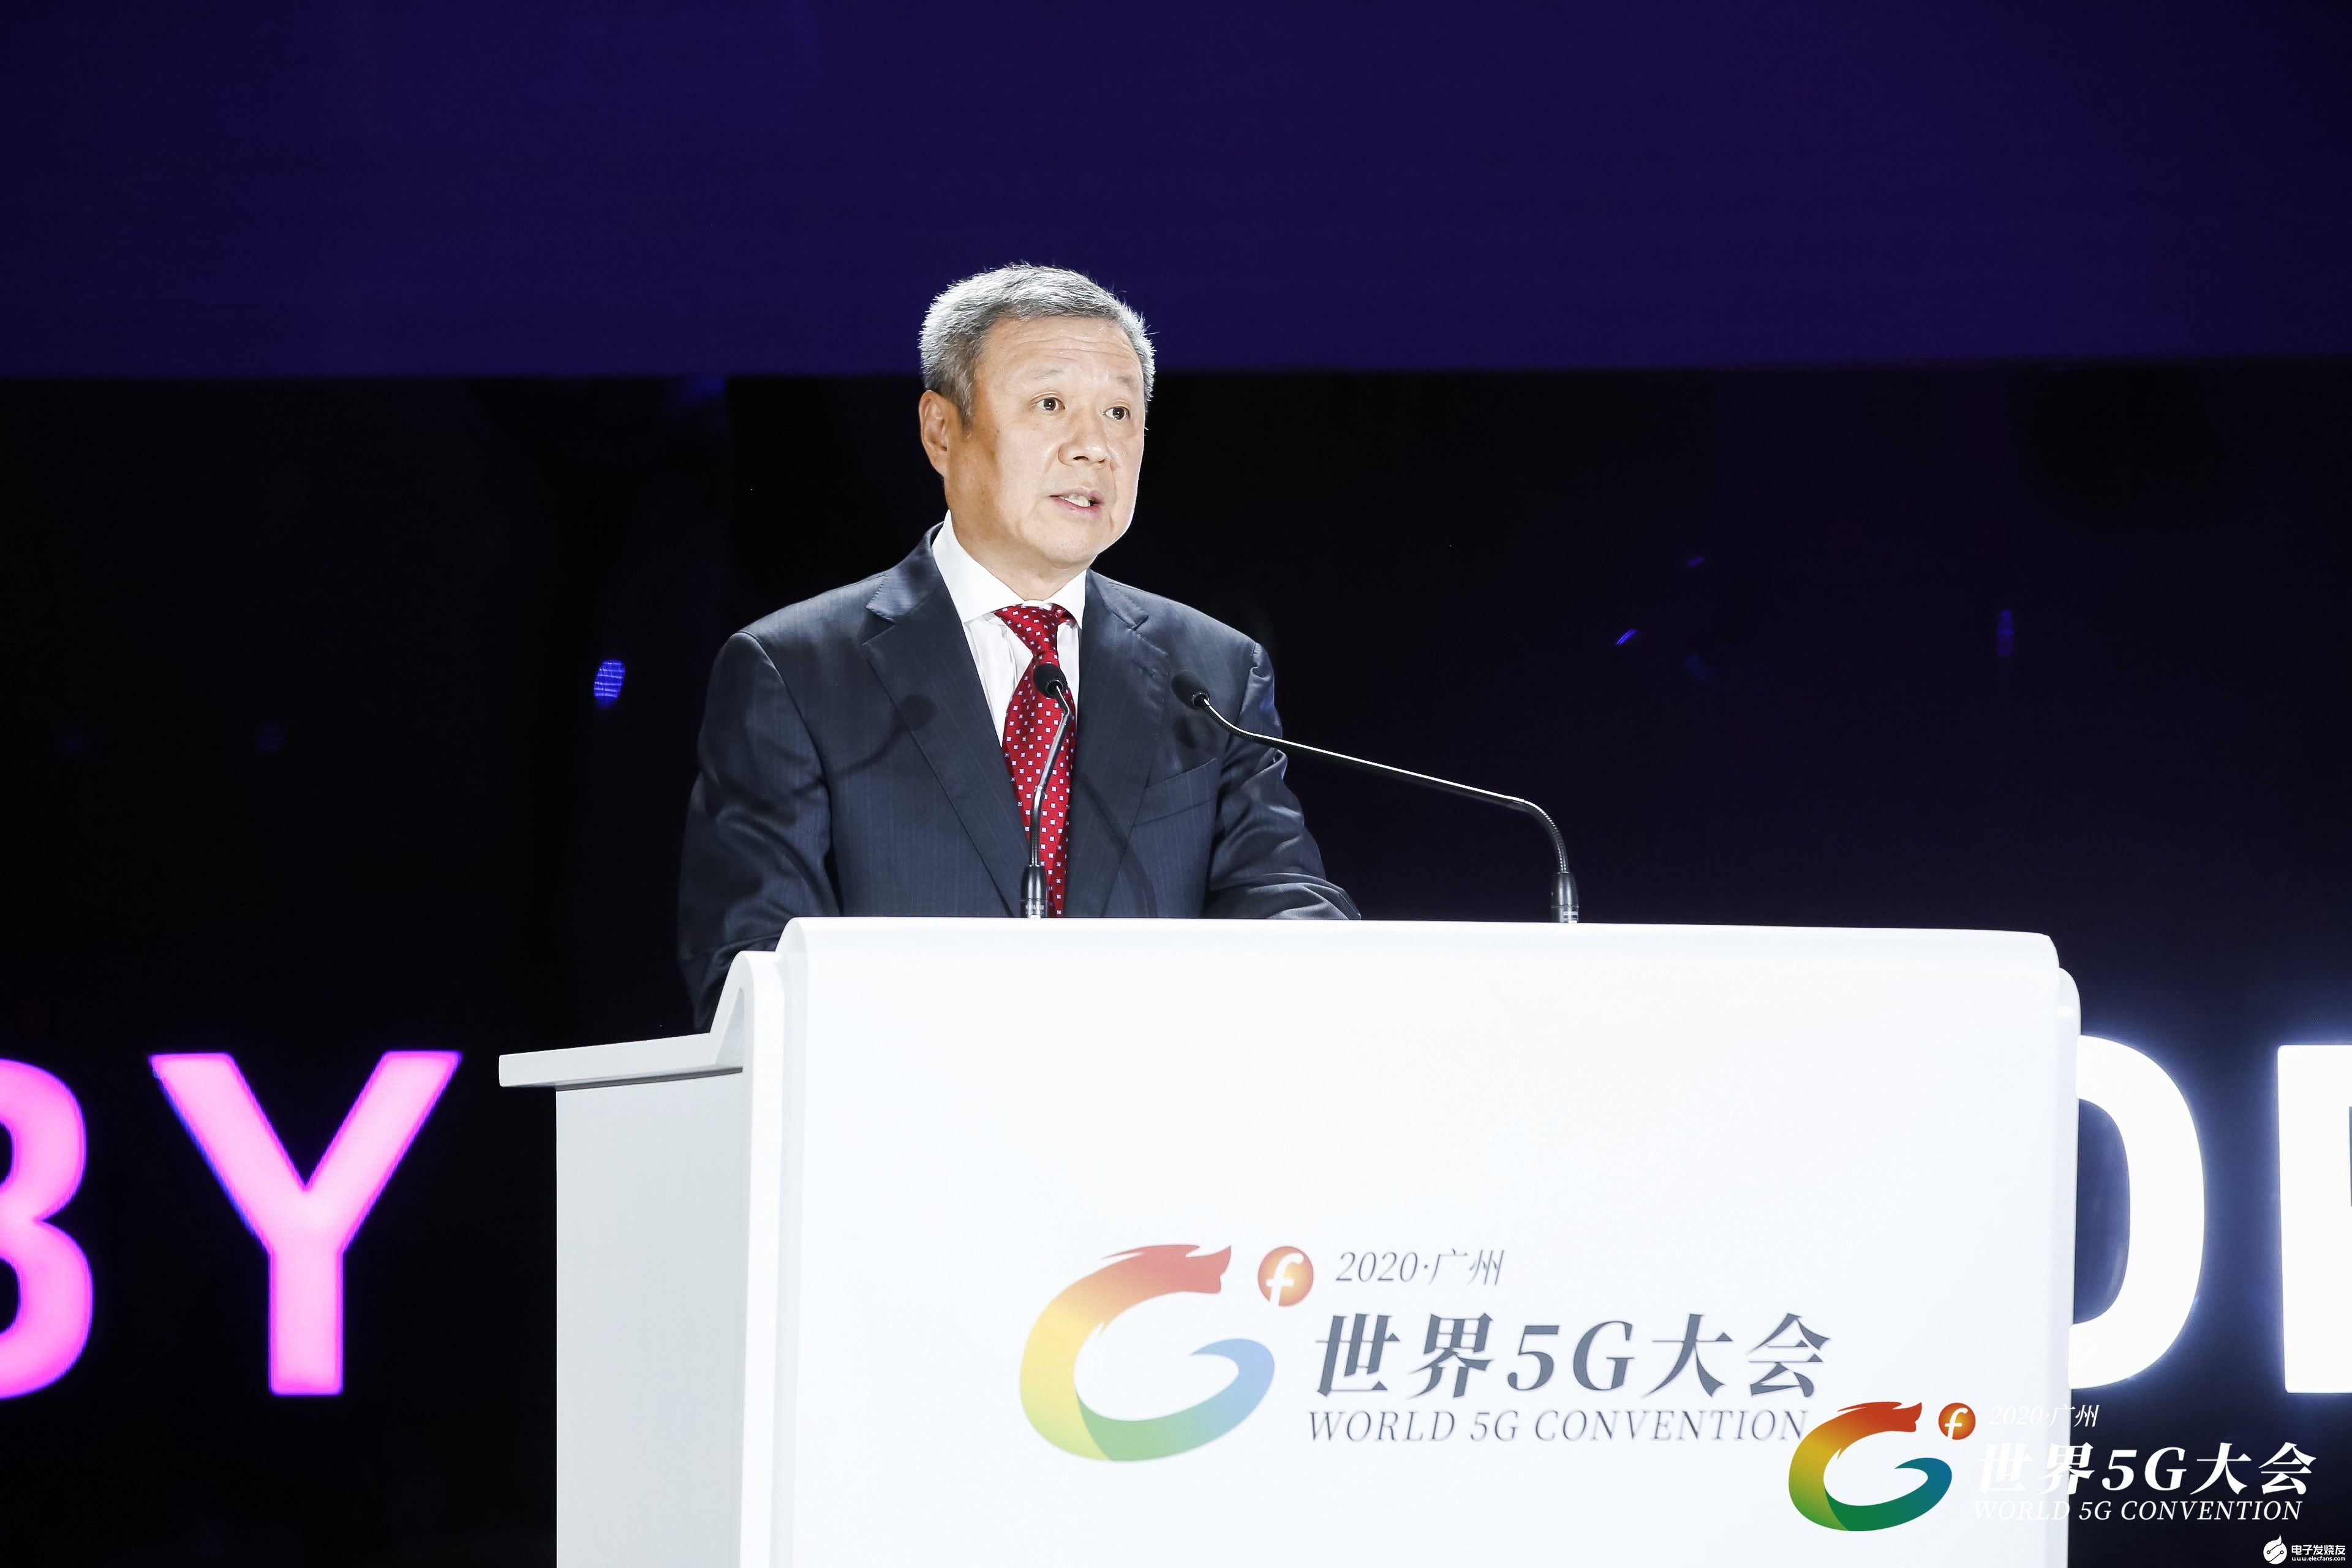 5G连接万物,中国联通开启智慧新未来